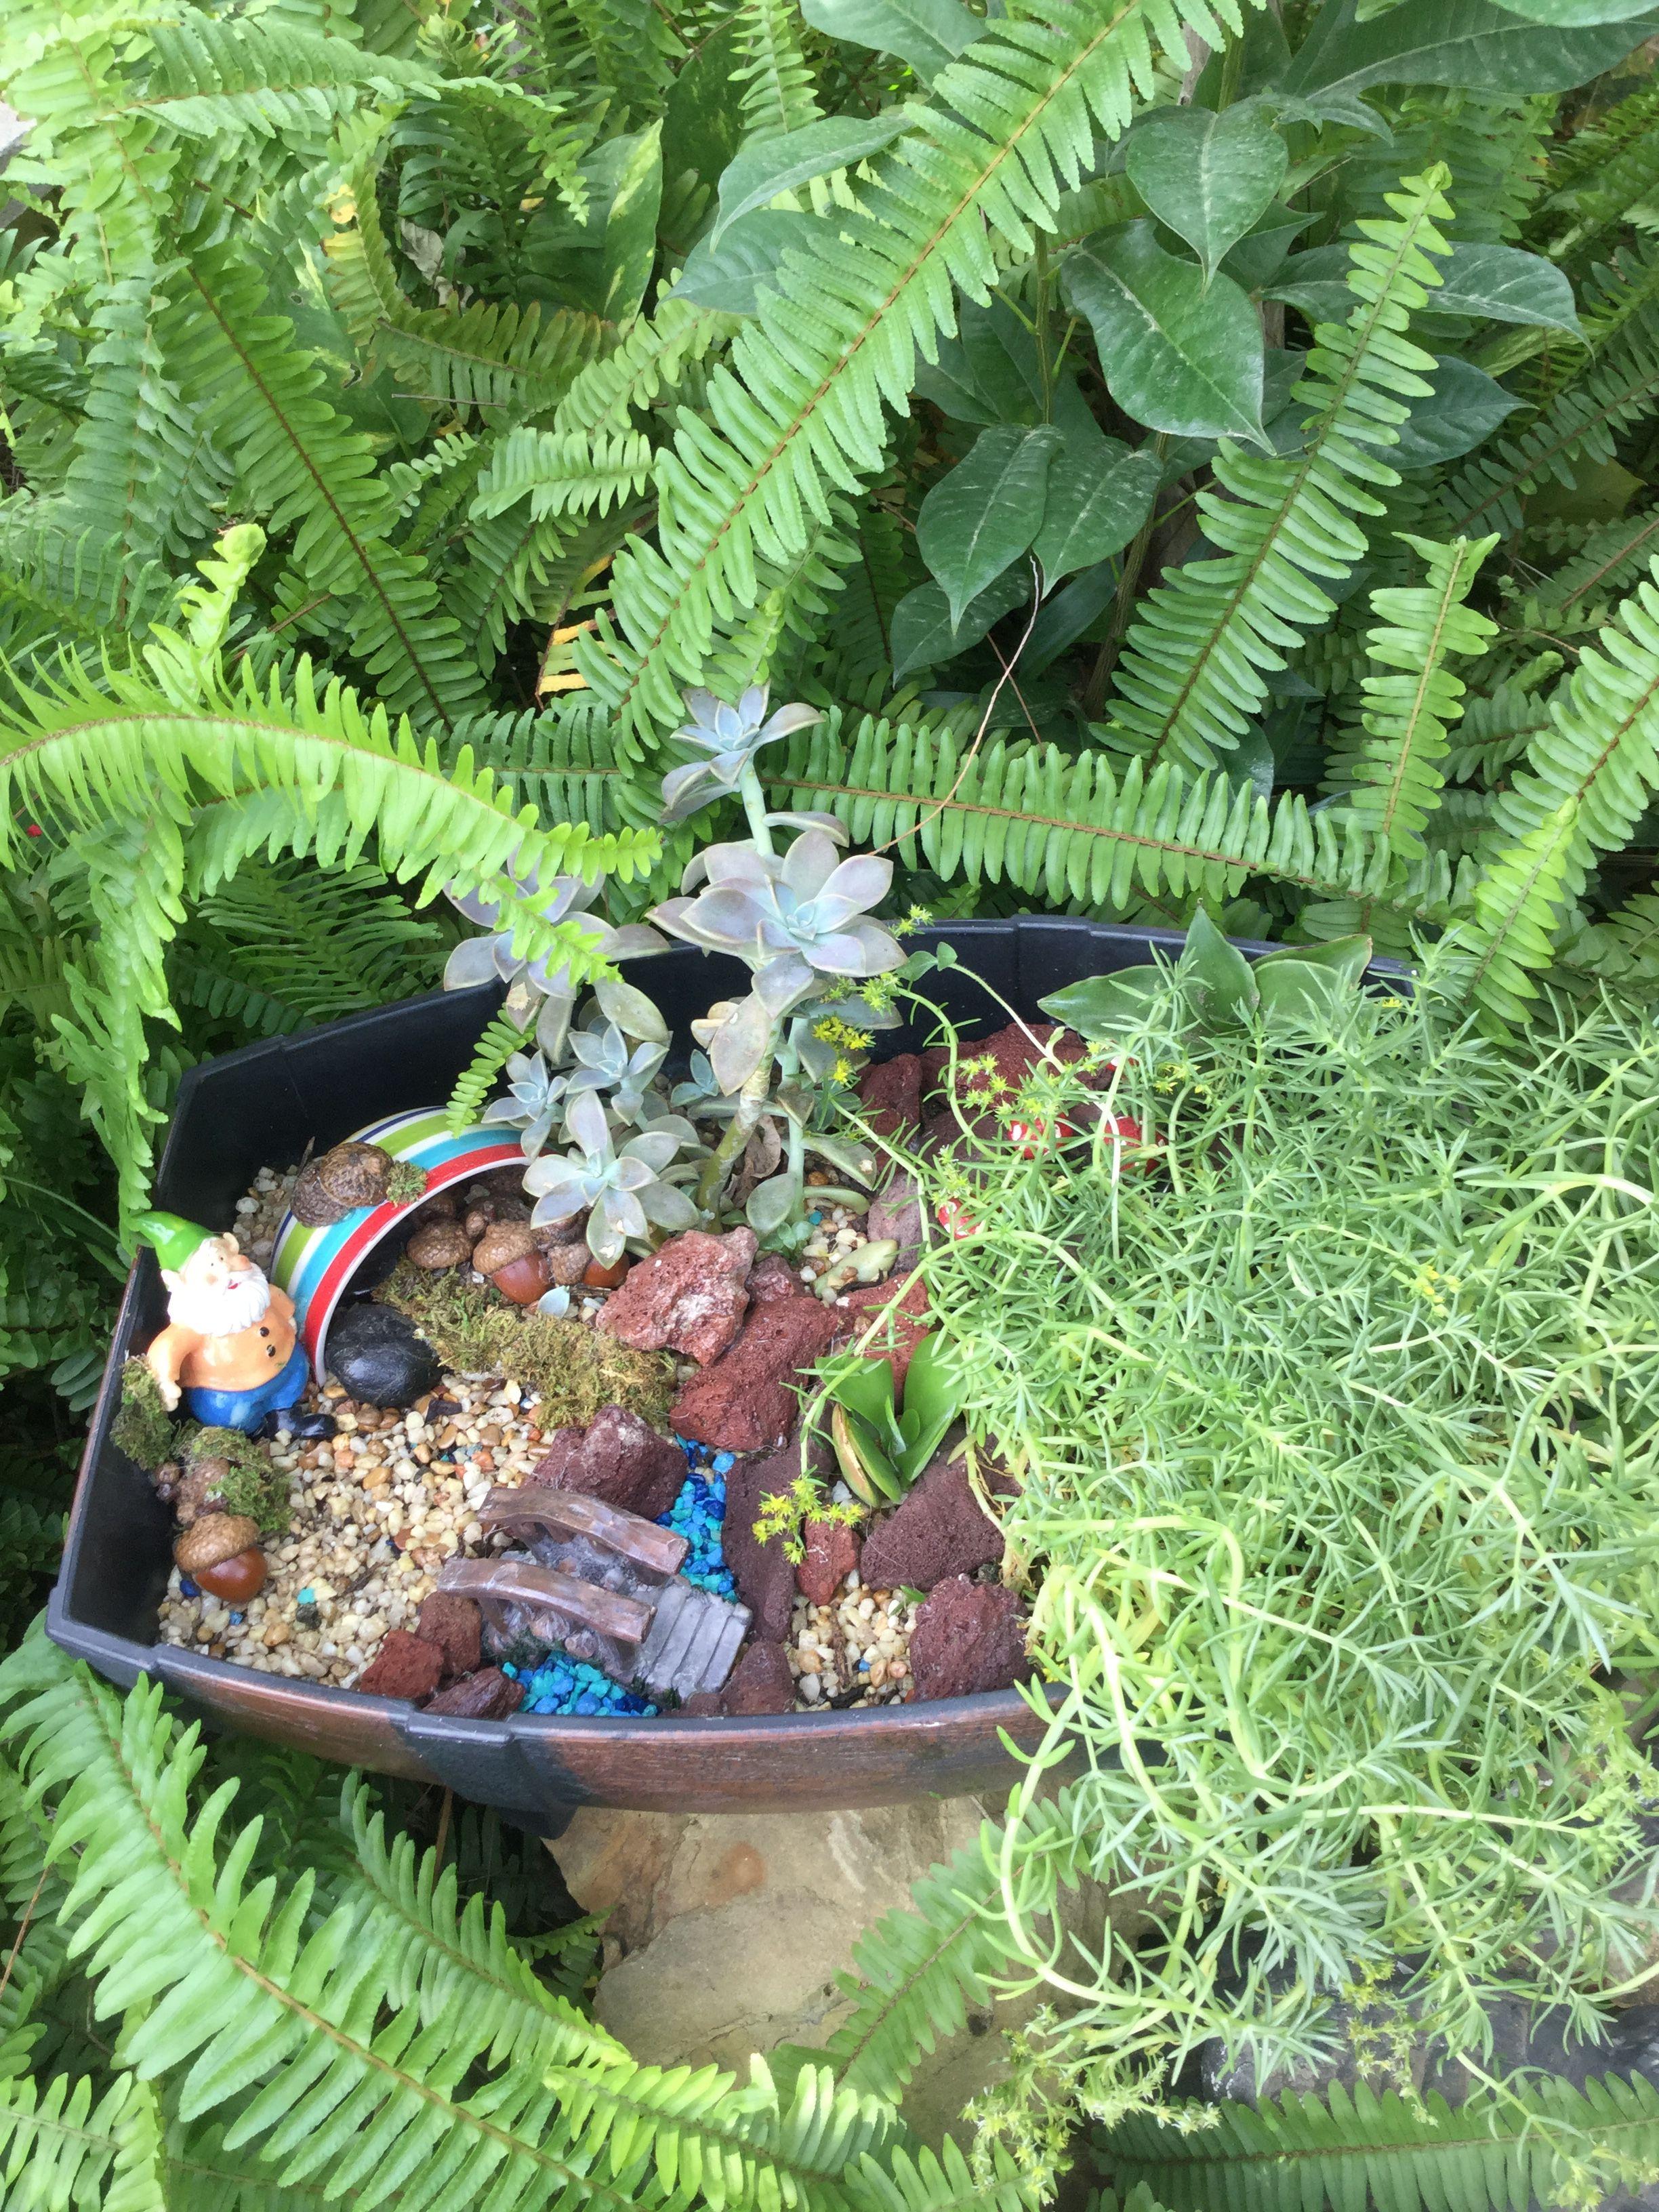 Medium Of Miniature Gnome Garden Ideas